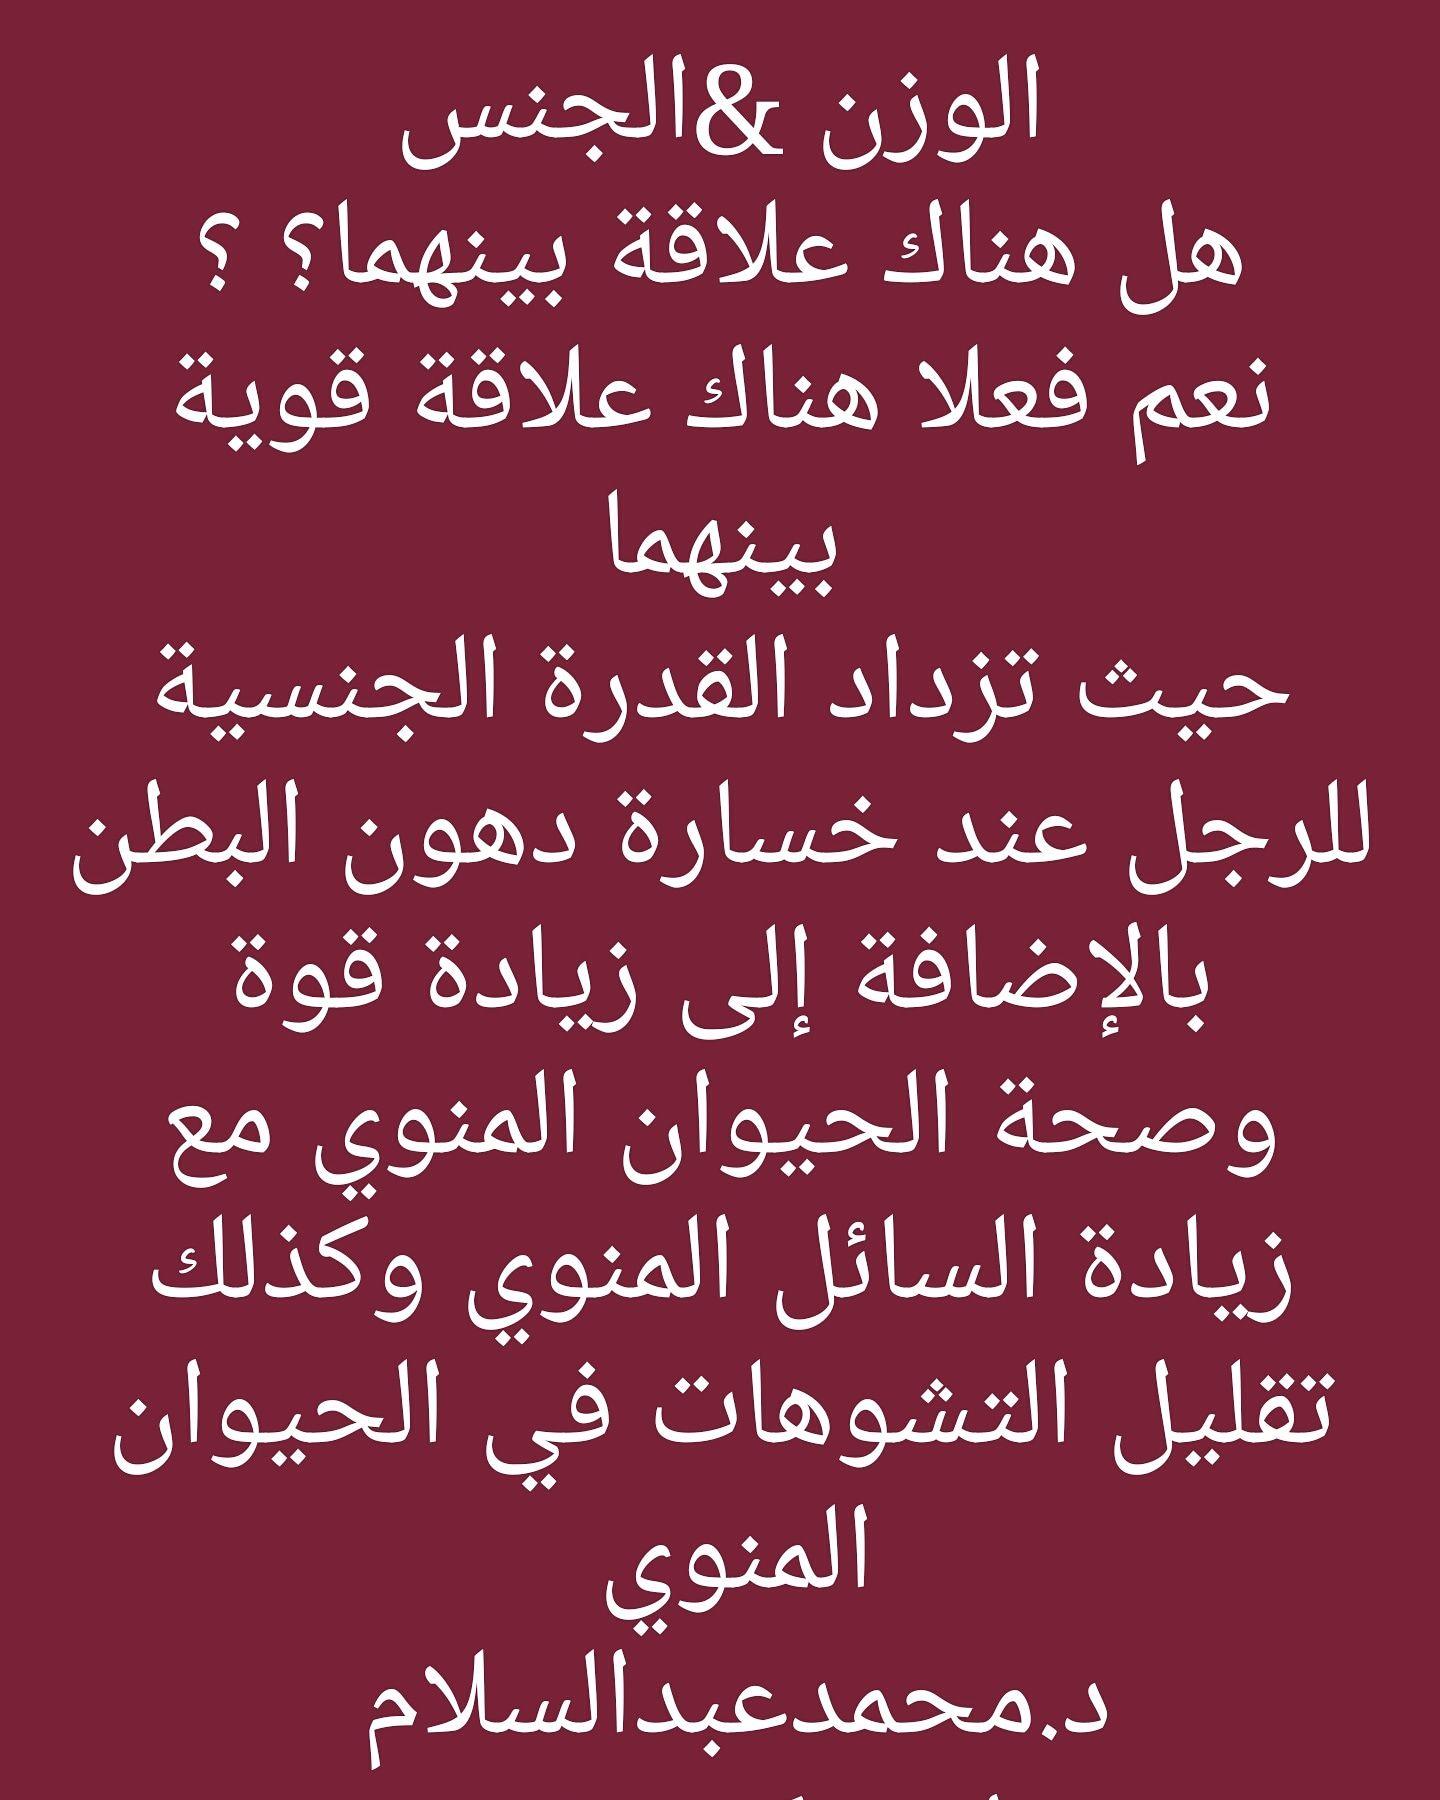 Pin By Dr Mohammed Abdelsalam On دايت كير في سلطنة ع مان Diet Care Arabic Calligraphy Calligraphy